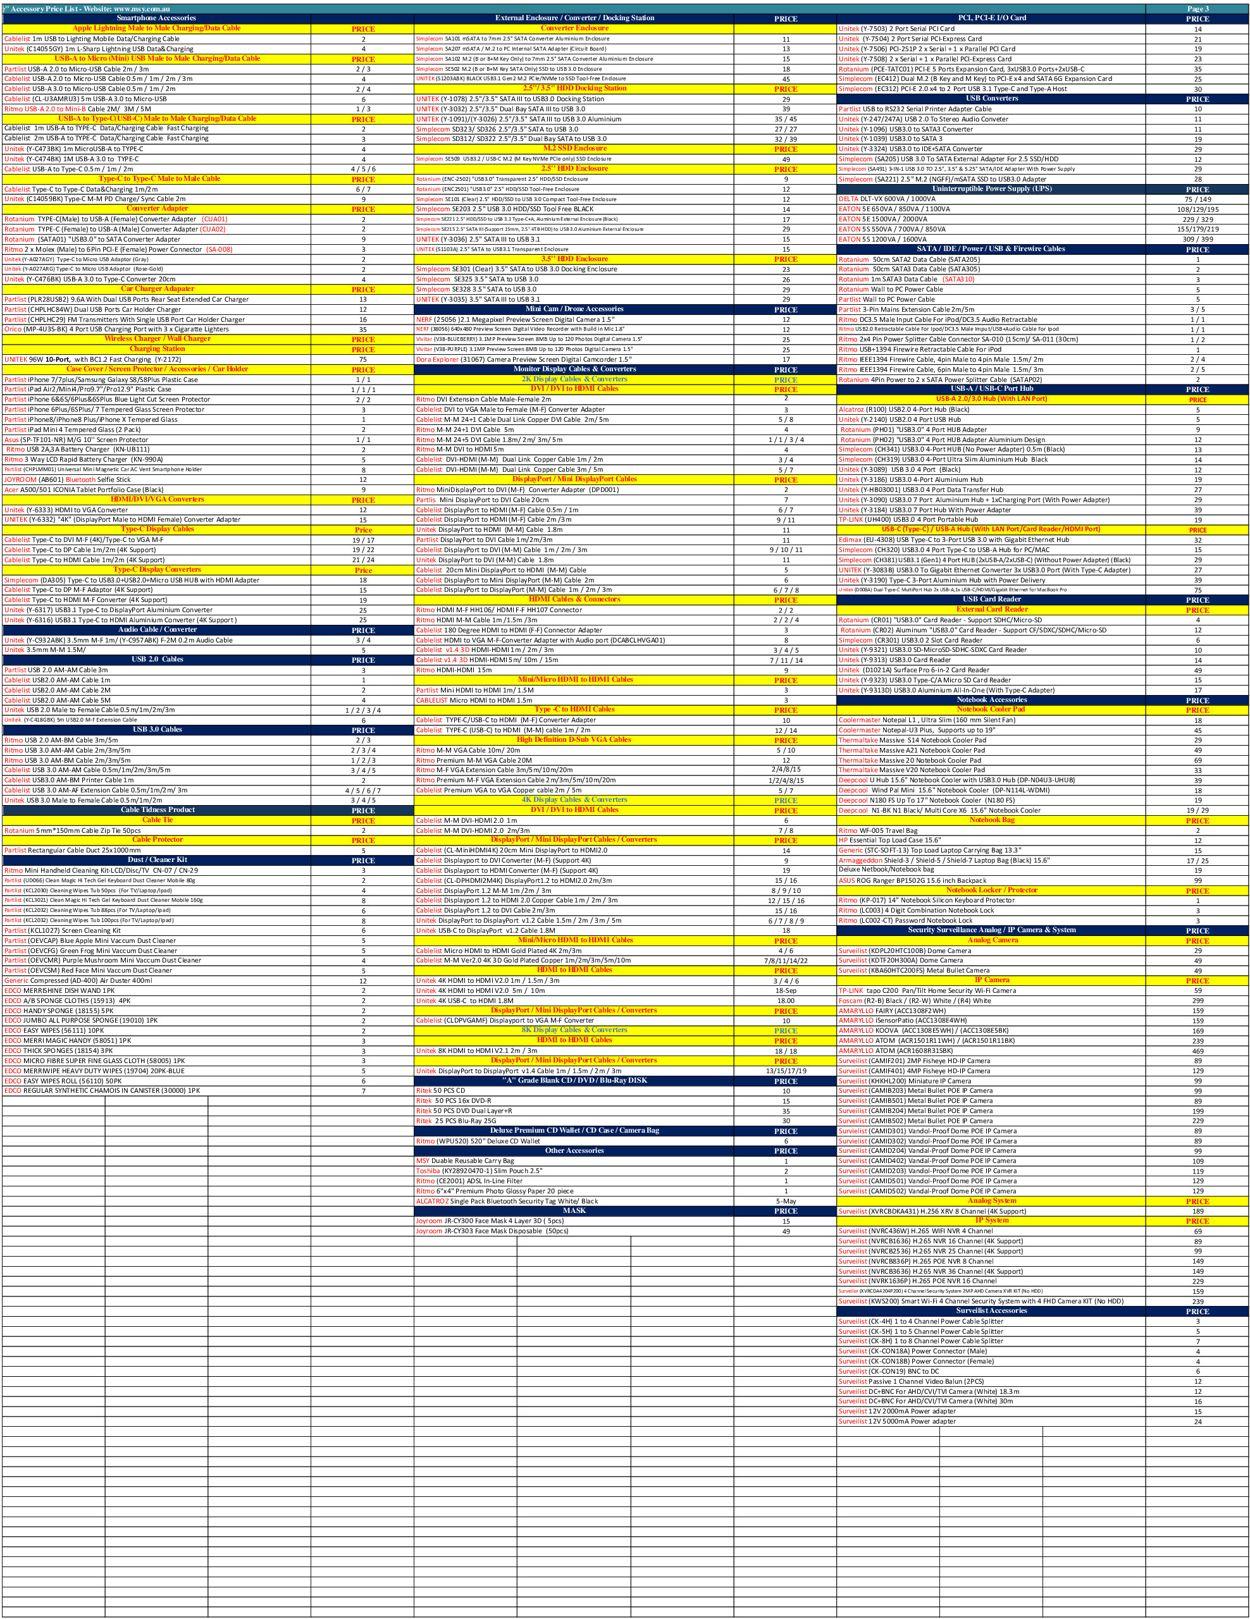 MSY Technology Catalogue - 18/02-18/02/2021 (Page 3)